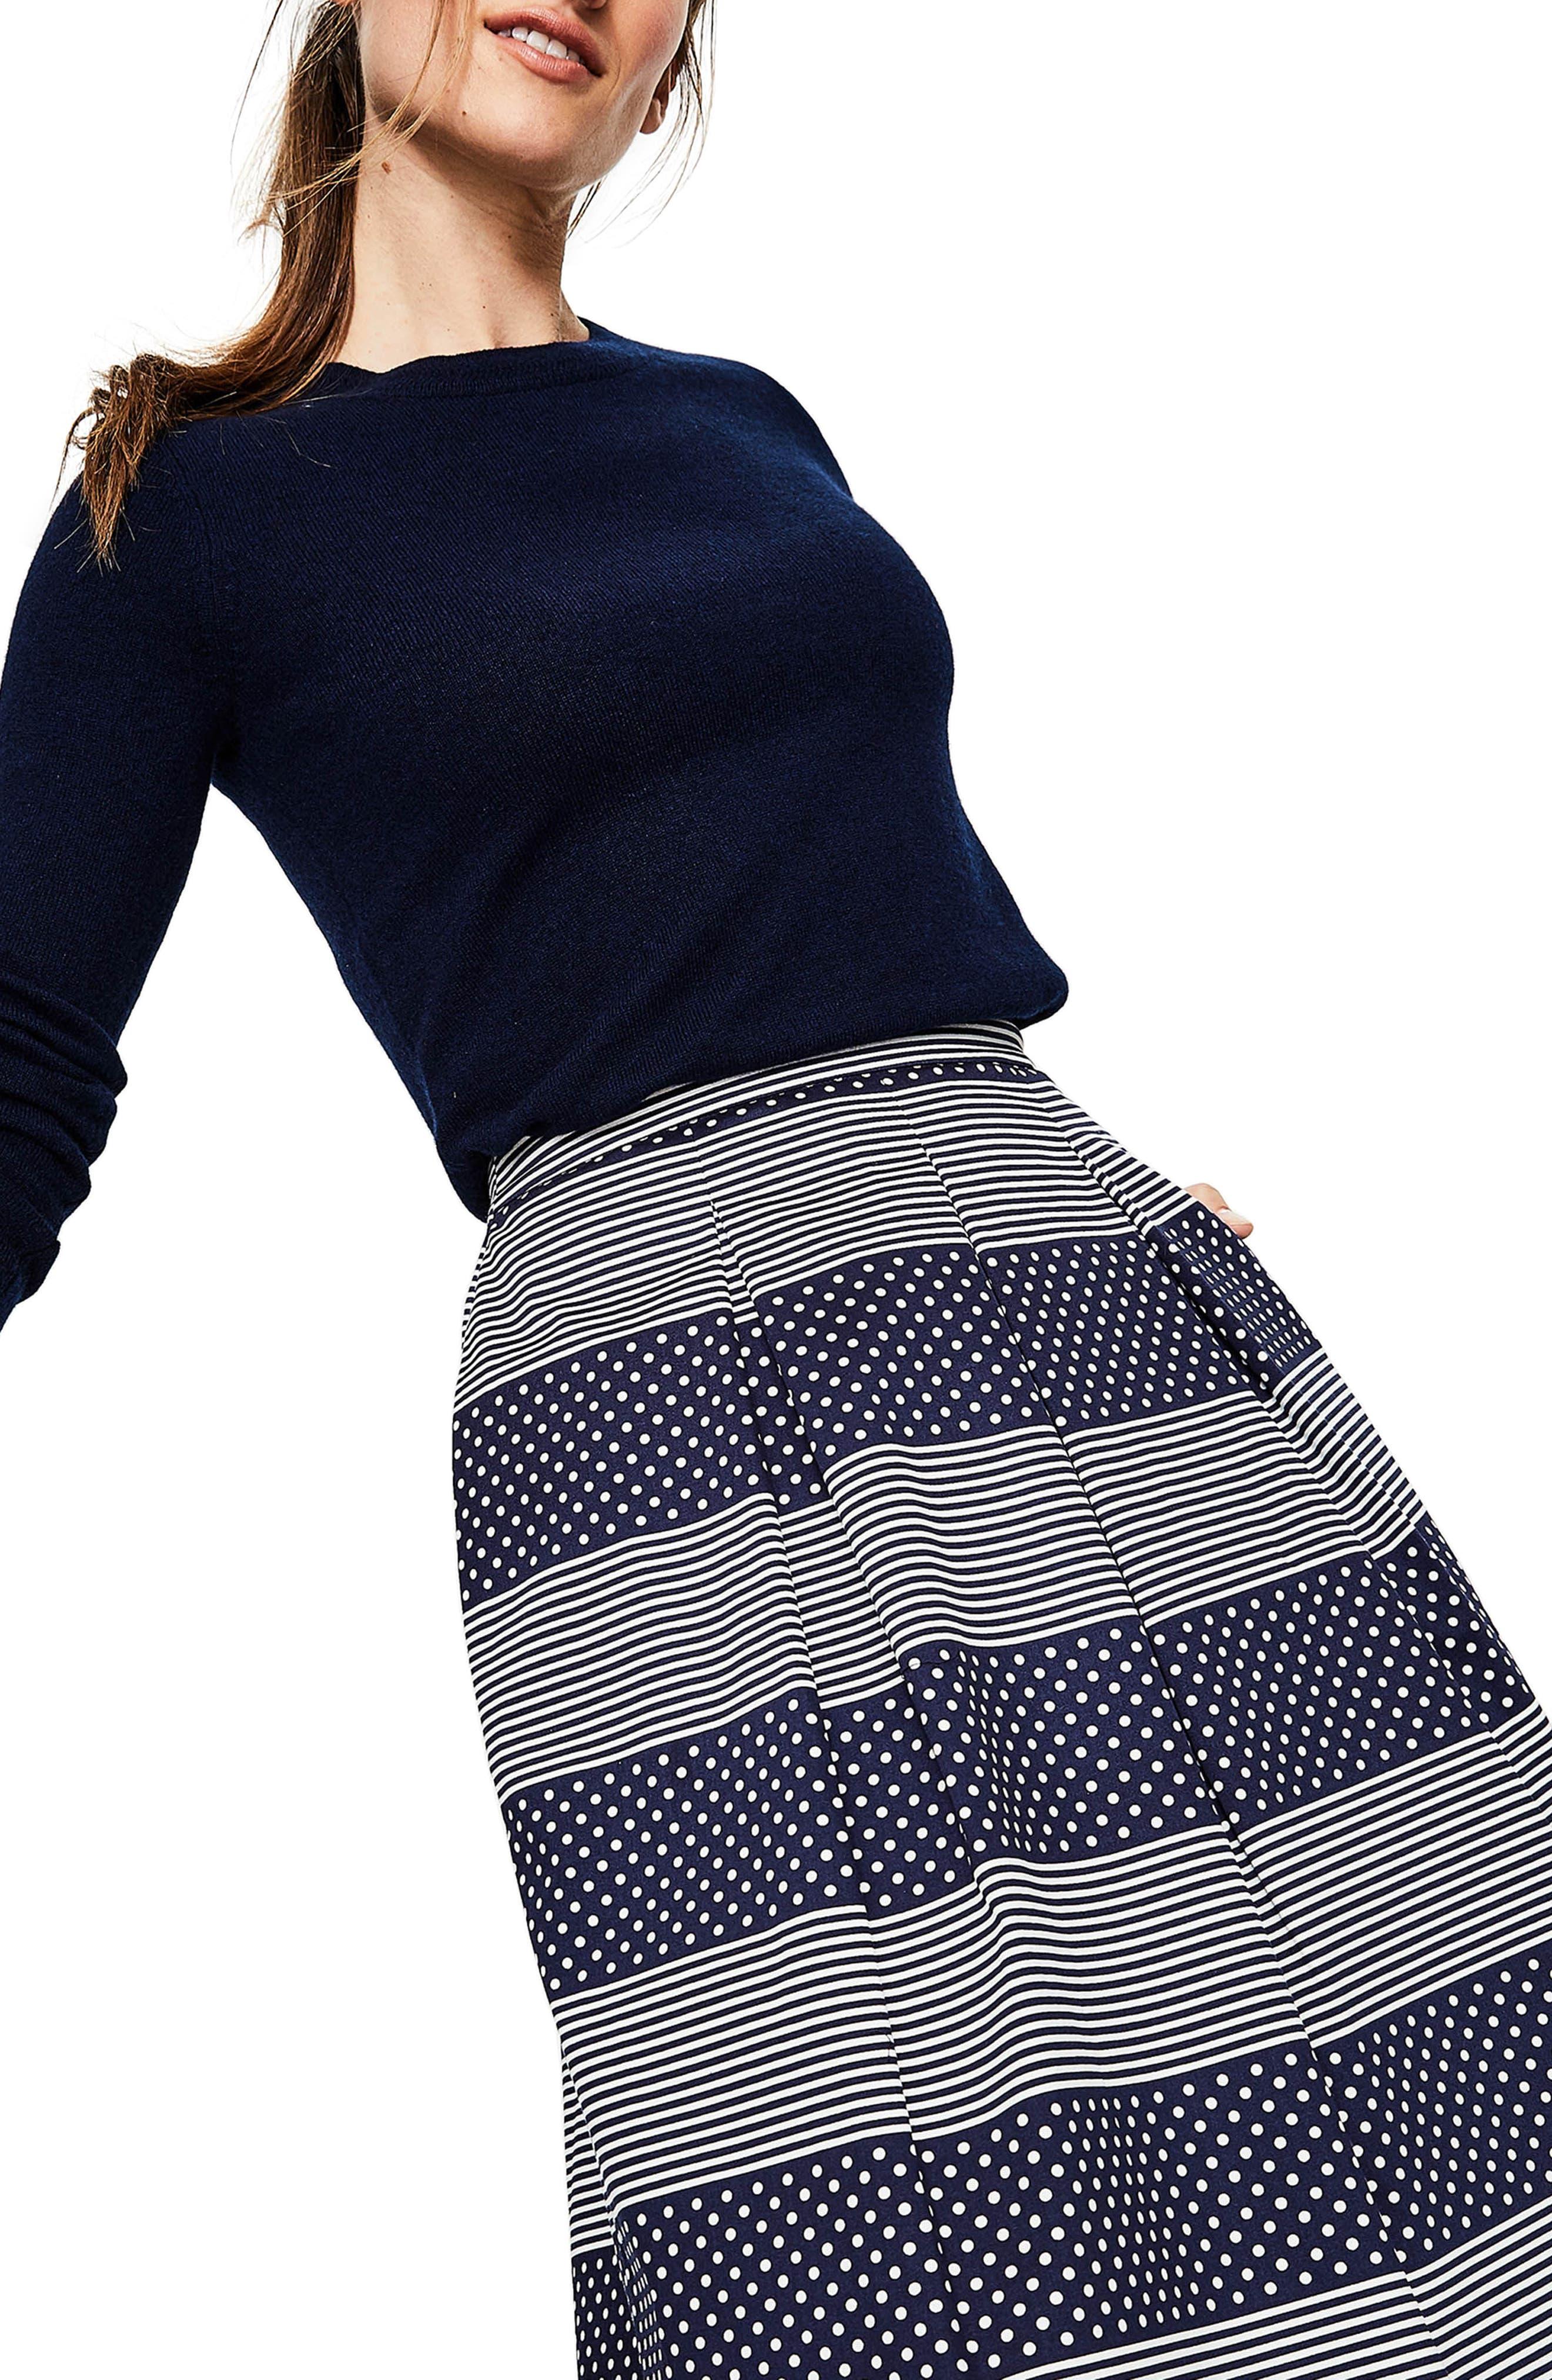 Lola Floral Flared Skirt,                             Alternate thumbnail 12, color,